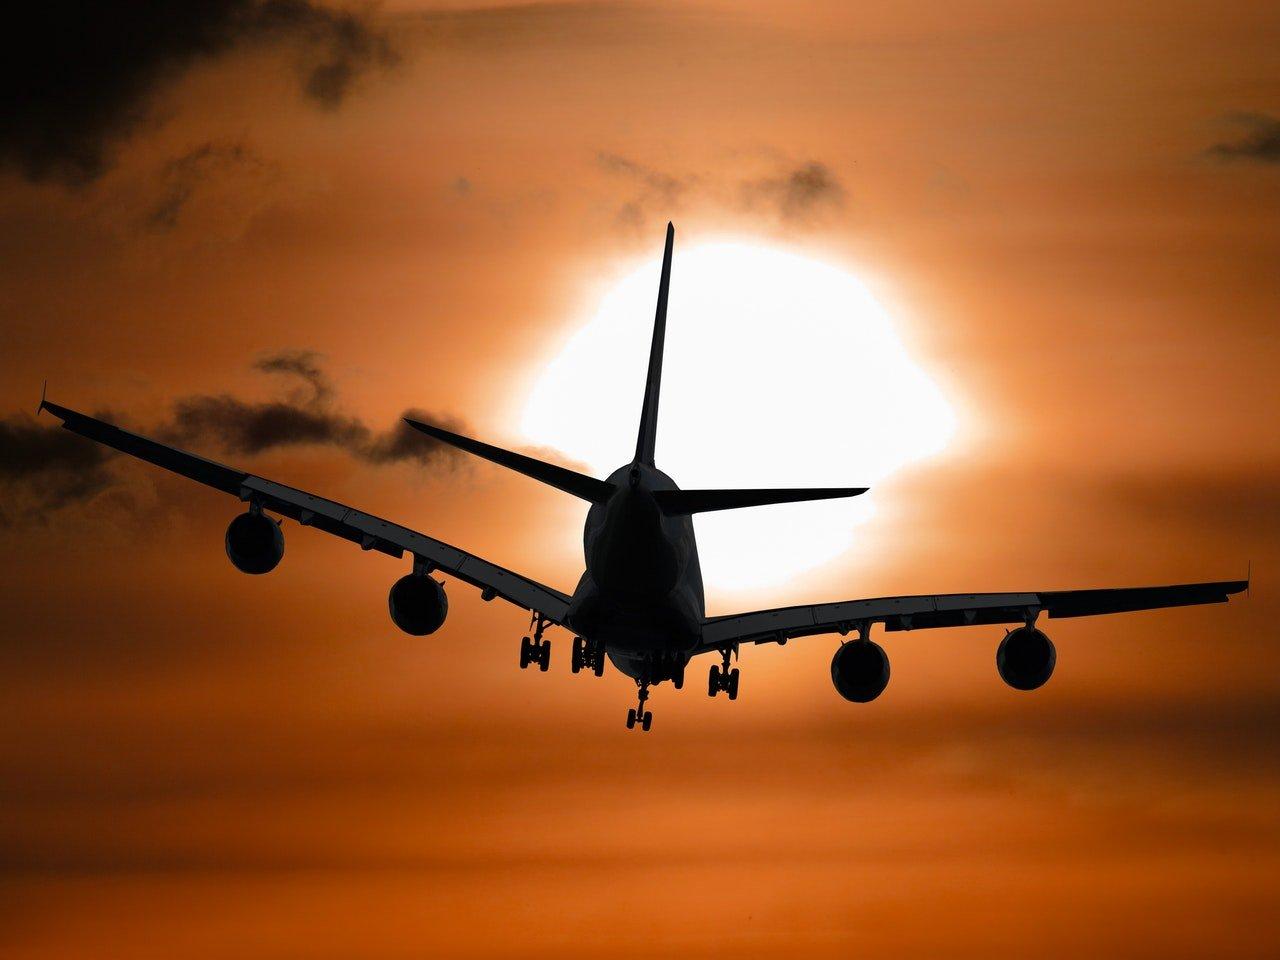 Restrictions On India-UK Flights